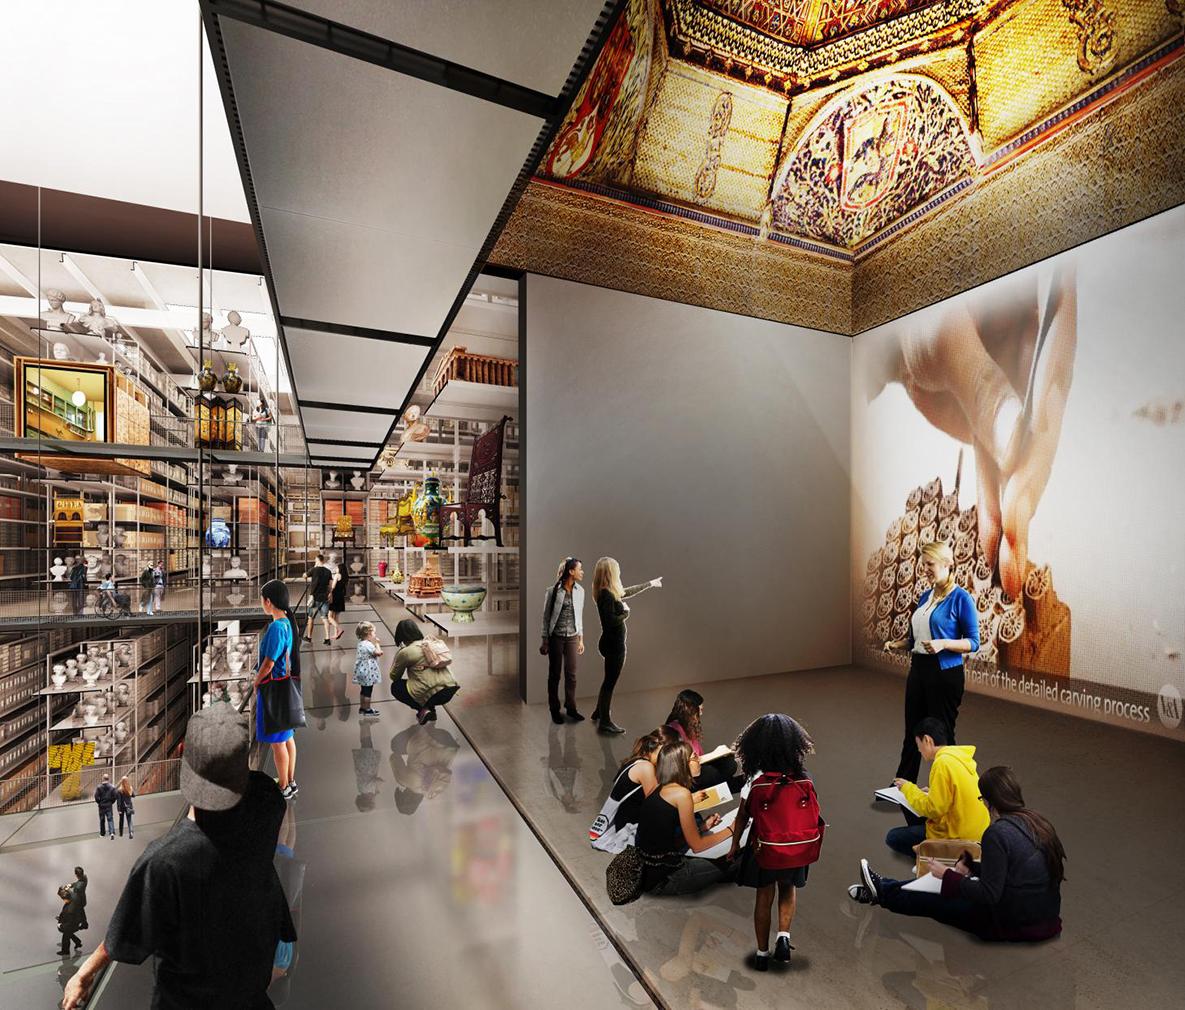 Interior render of the Diller Scofidio + Renfro designed Here East building. Courtesy Diller Scofidio + Renfro